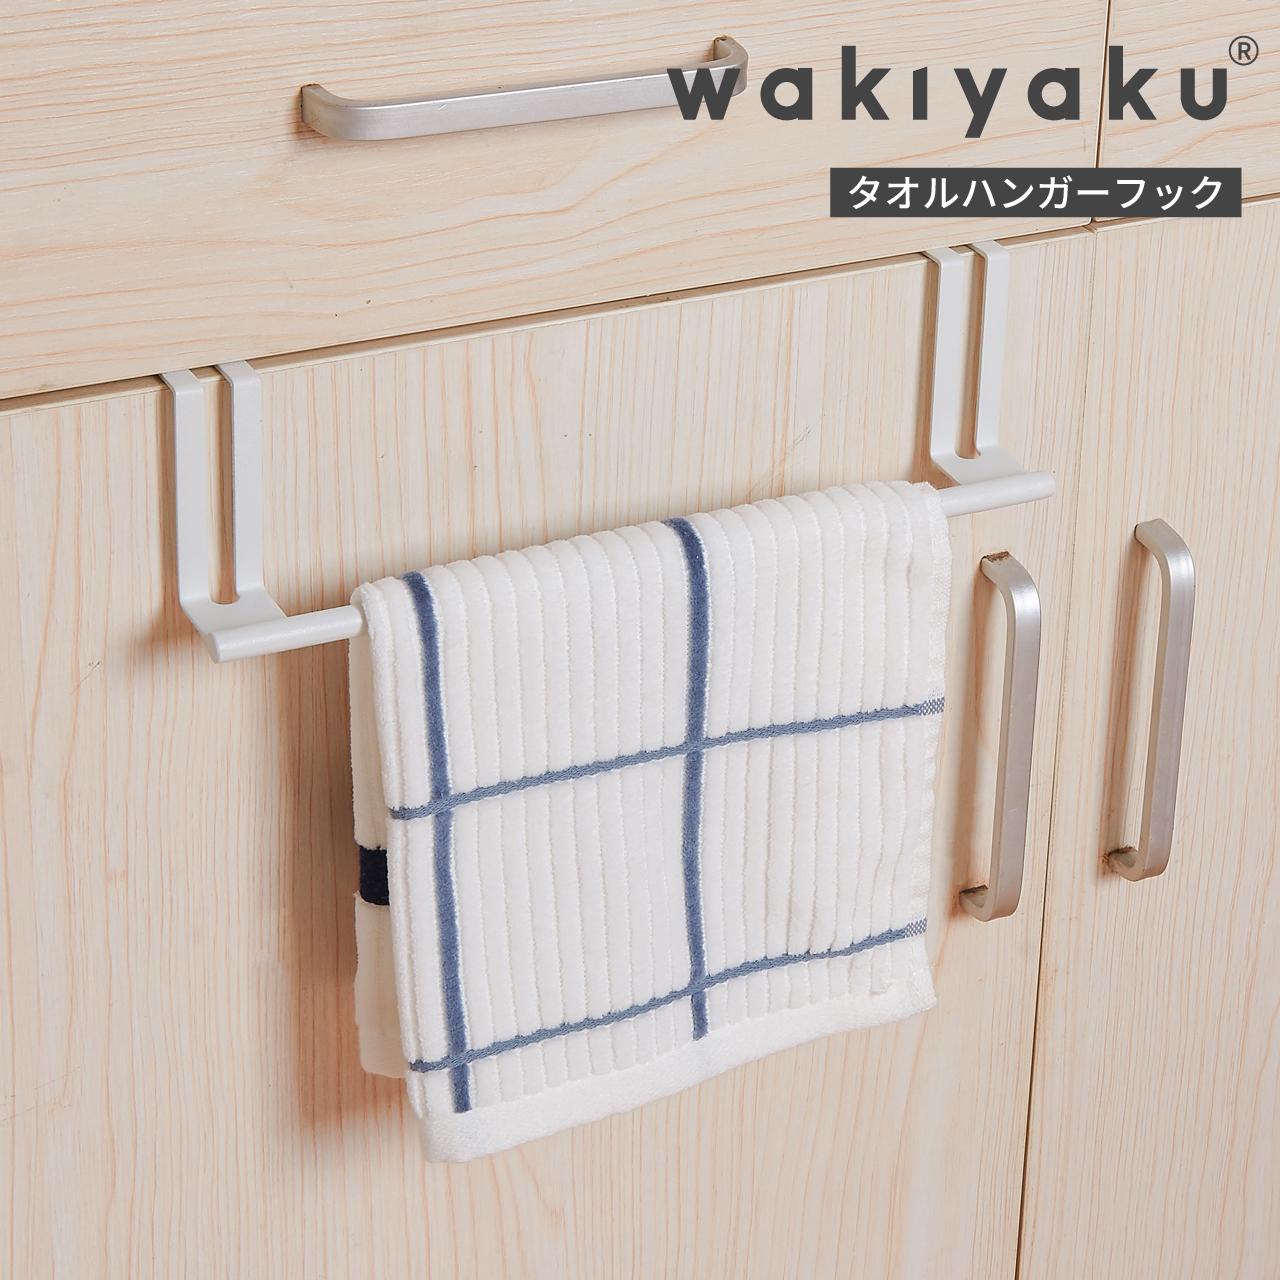 wakiyaku R タオルハンガーフック 激安超特価 キッチン ギフト ドア タオル 片付け タオル掛け 宅配便指定商品 バスルーム収納 ラック